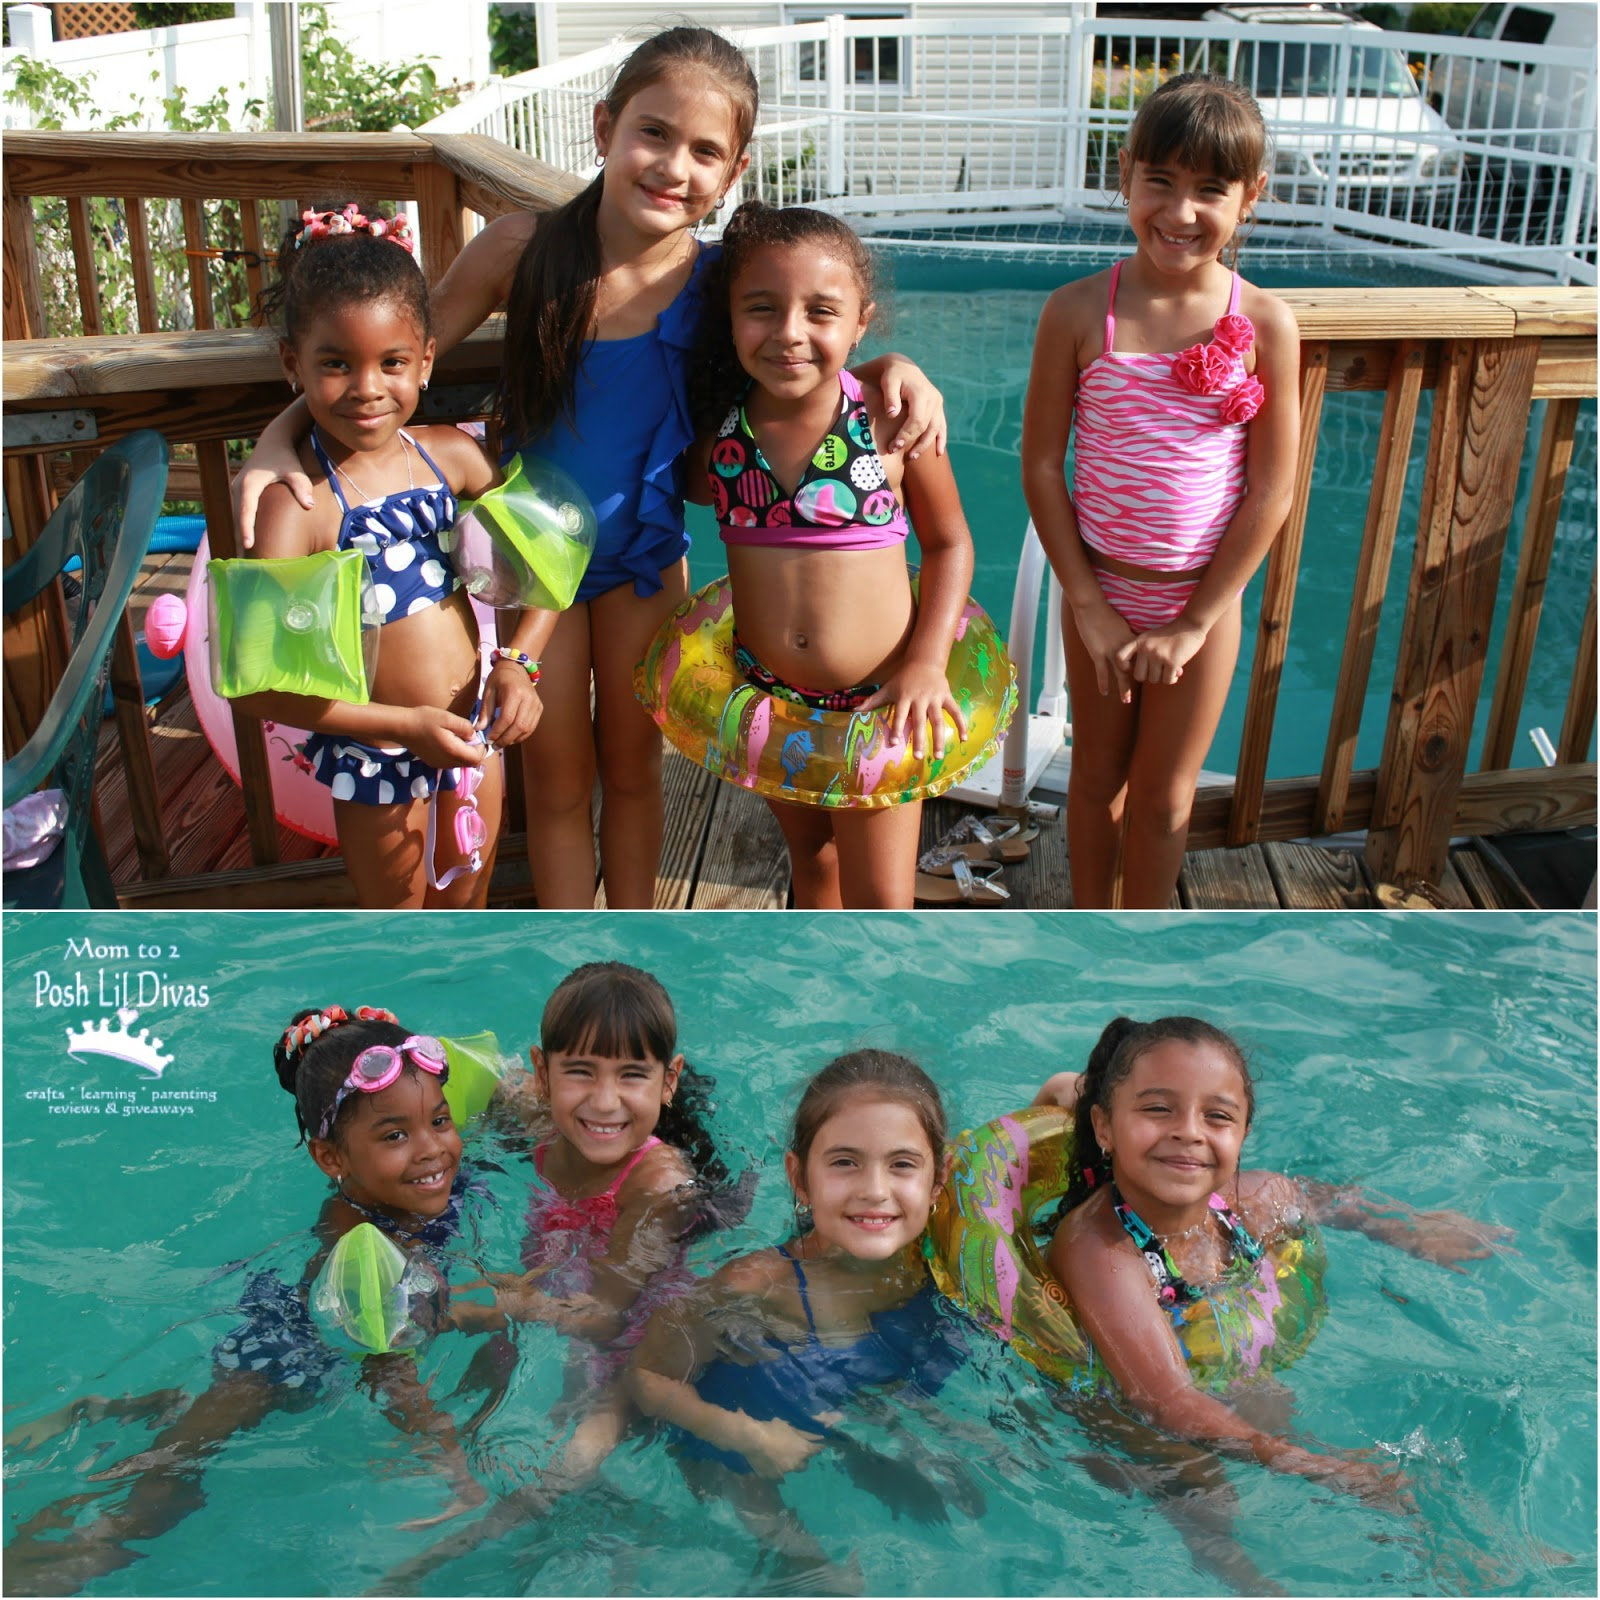 Mom to 2 Posh Lil Divas Summer Fun Family Friends & Bomb Pops